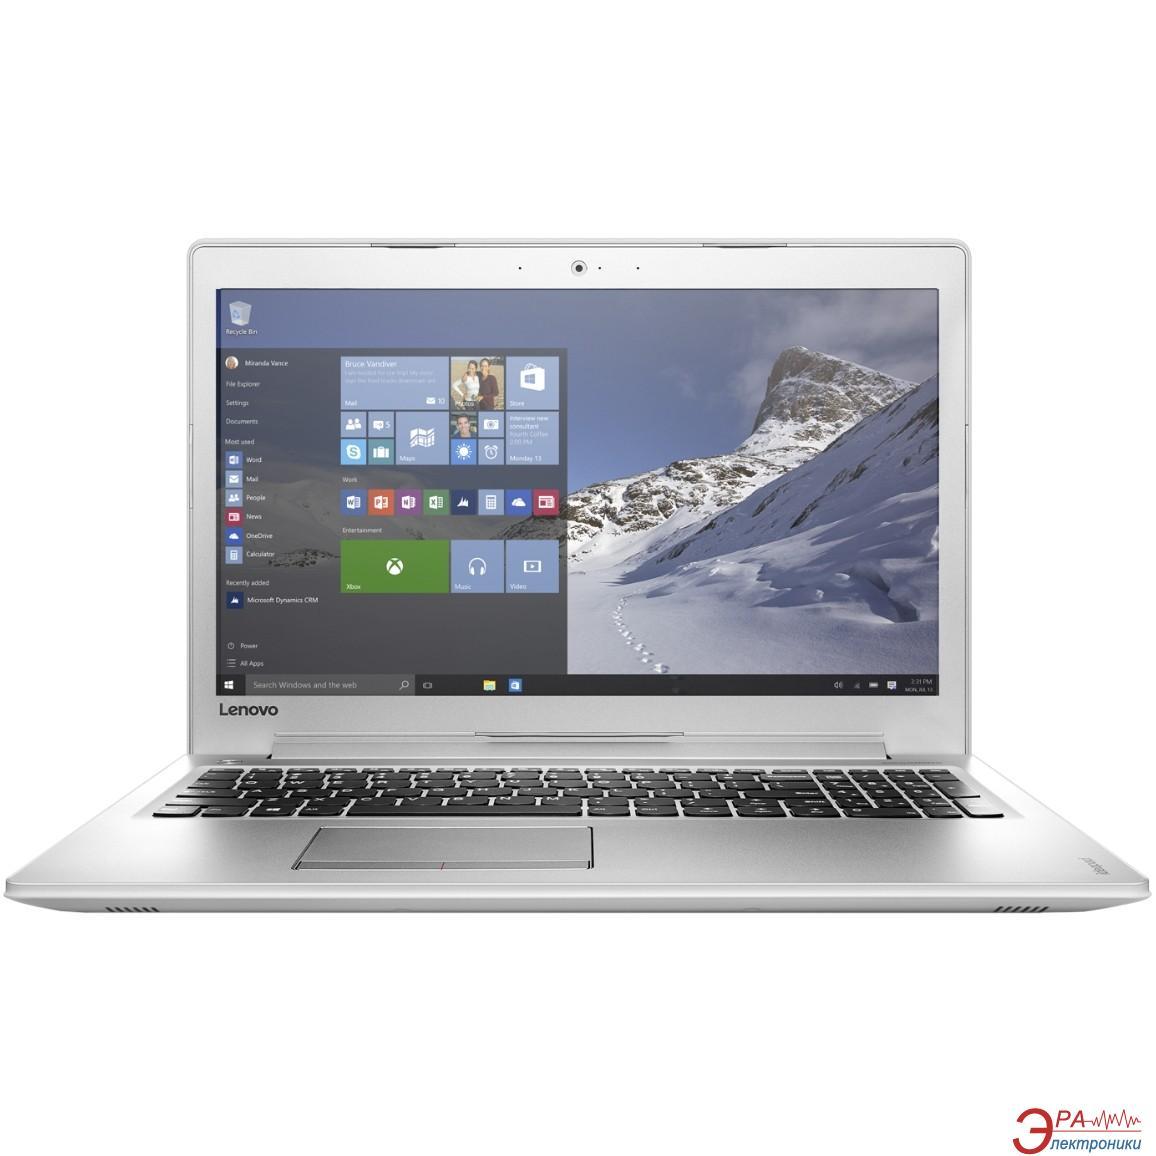 Ноутбук Lenovo IdeaPad 510-15IKB (80SV00BNRA) White 15,6